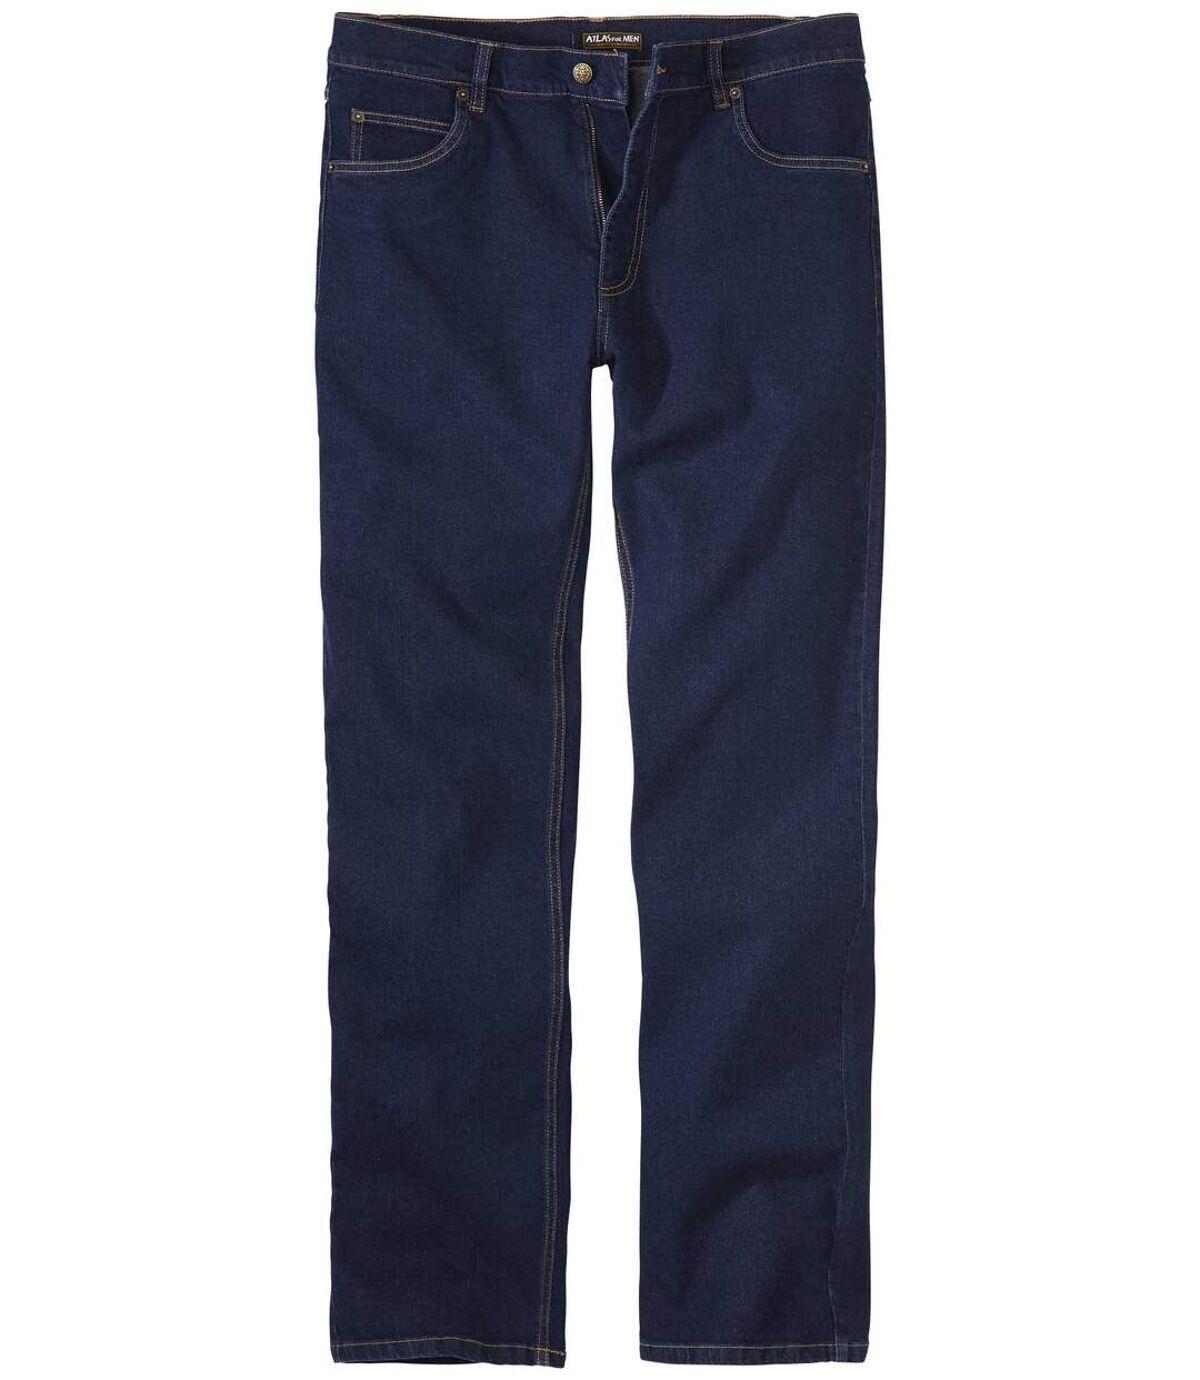 Jean Regular Stretch Blue  Atlas For Men